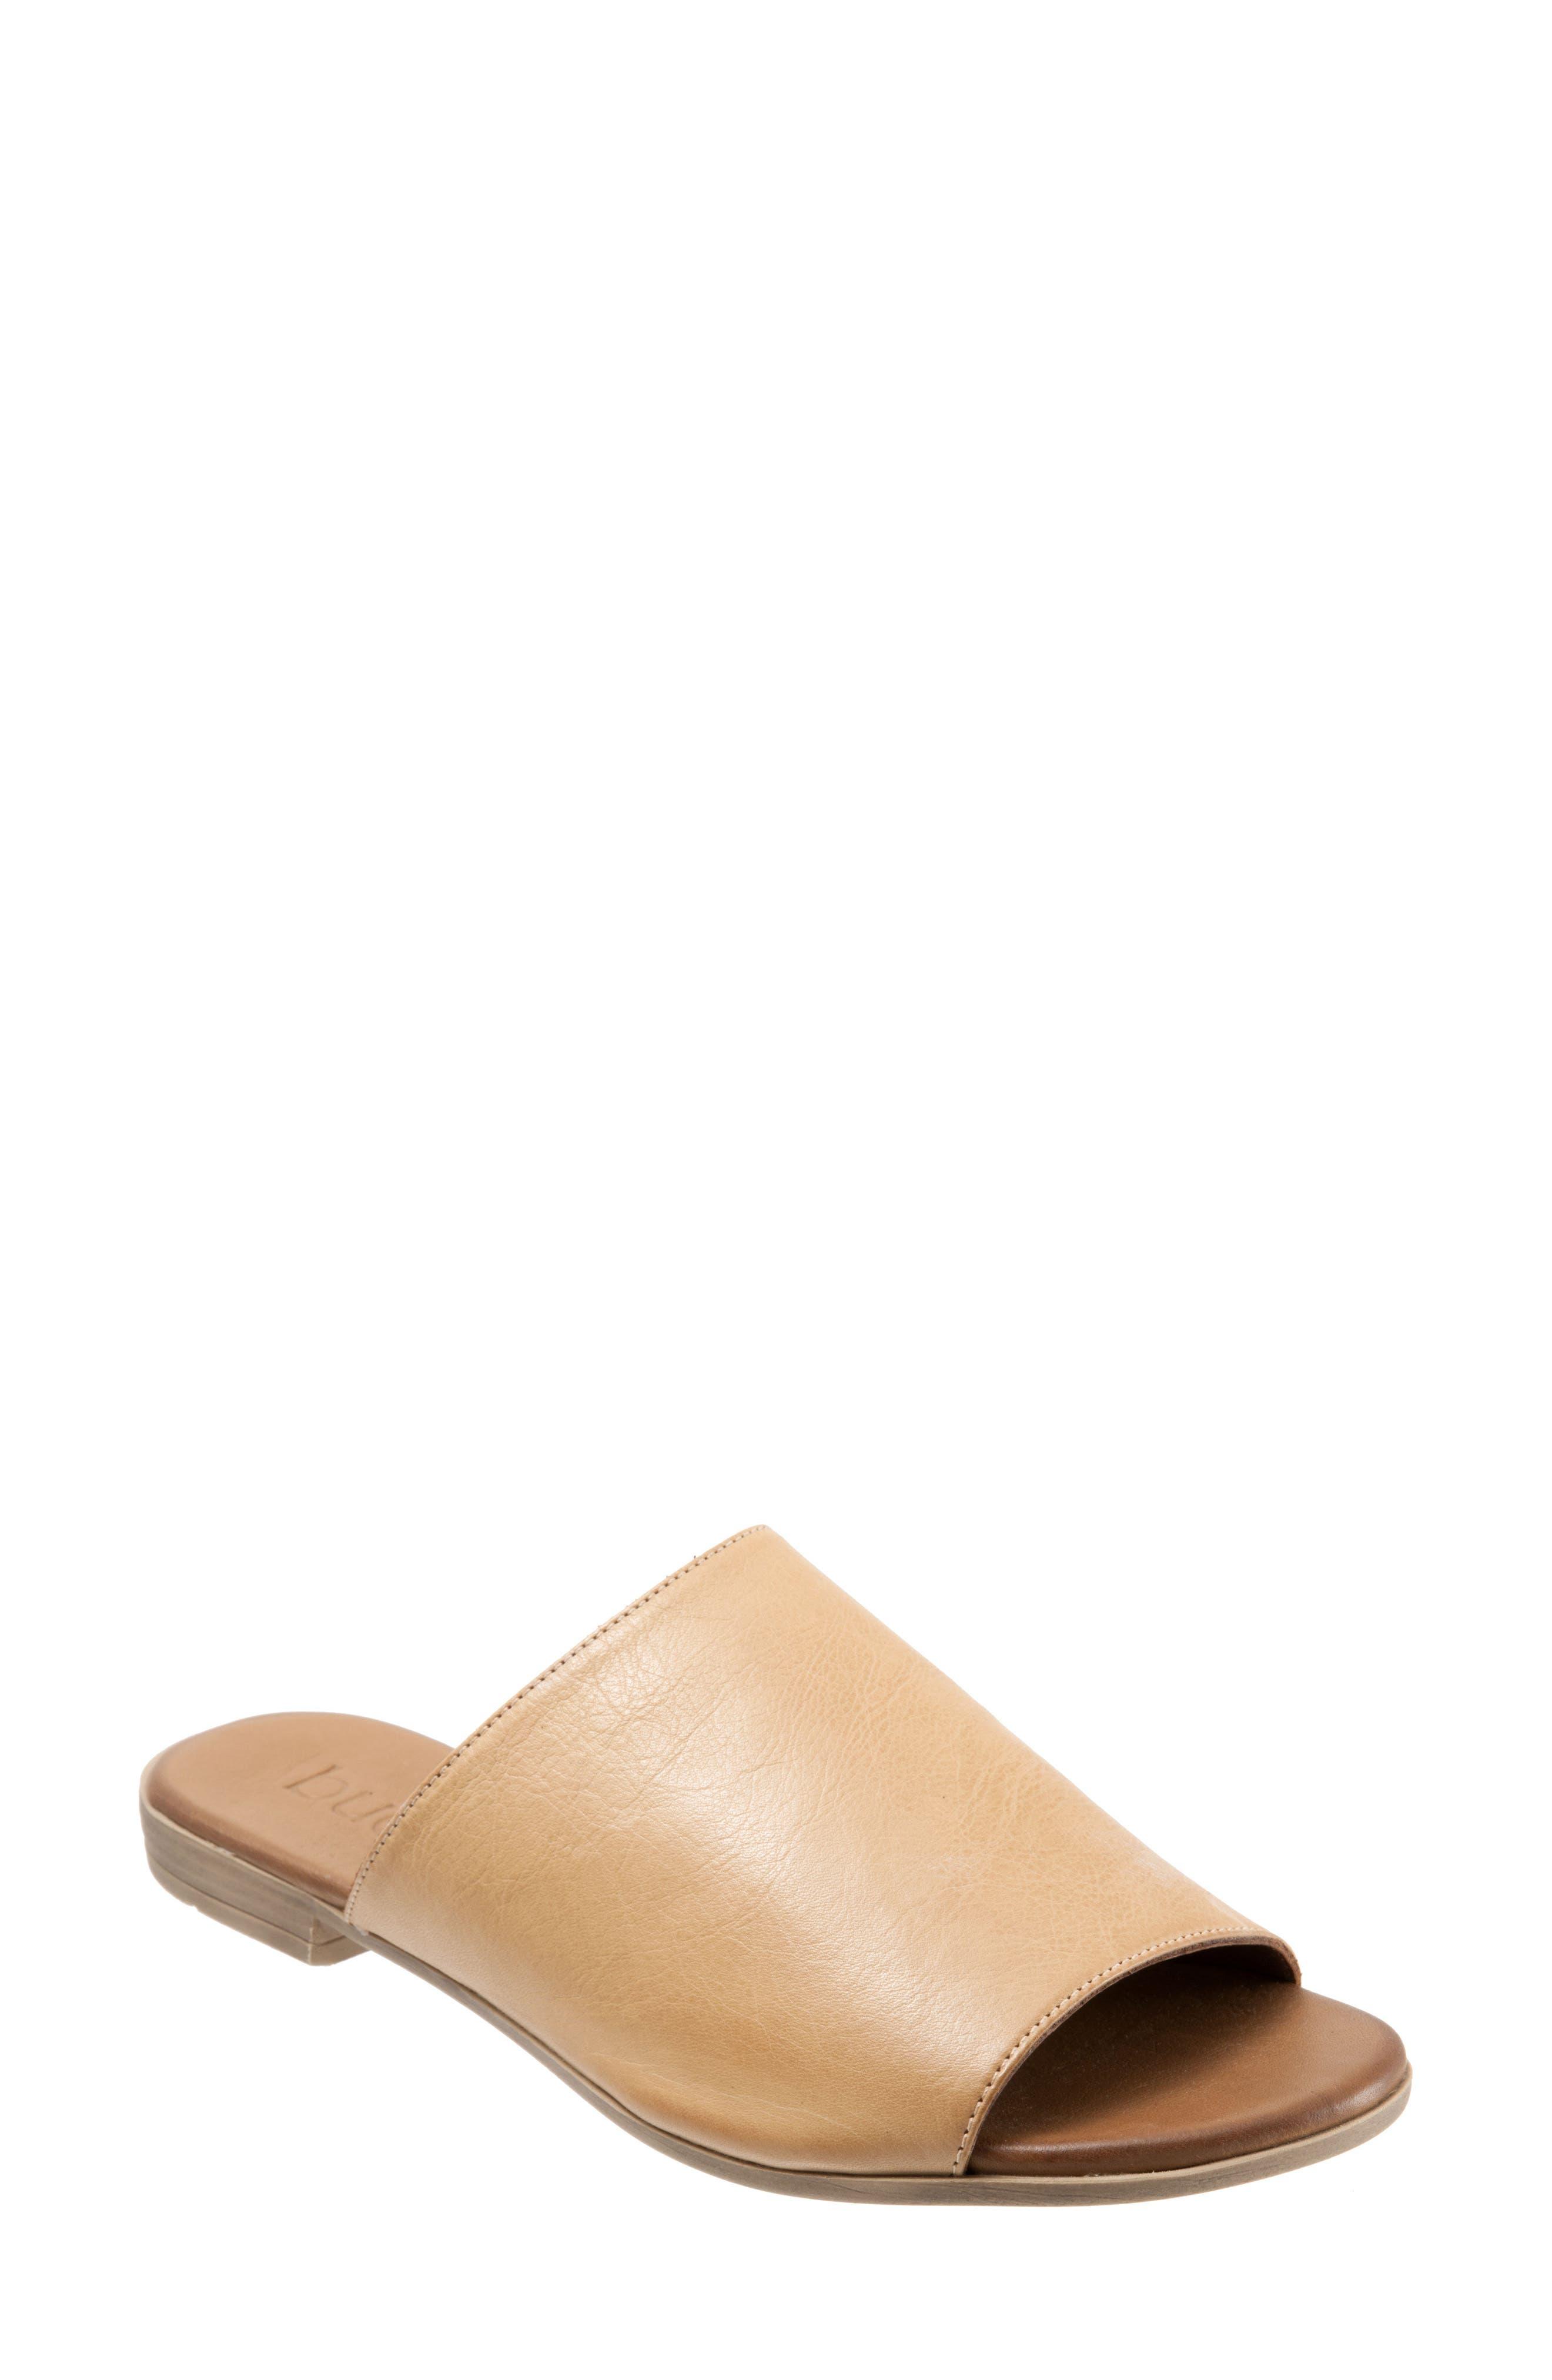 Bueno Jory Slide Sandal - Beige